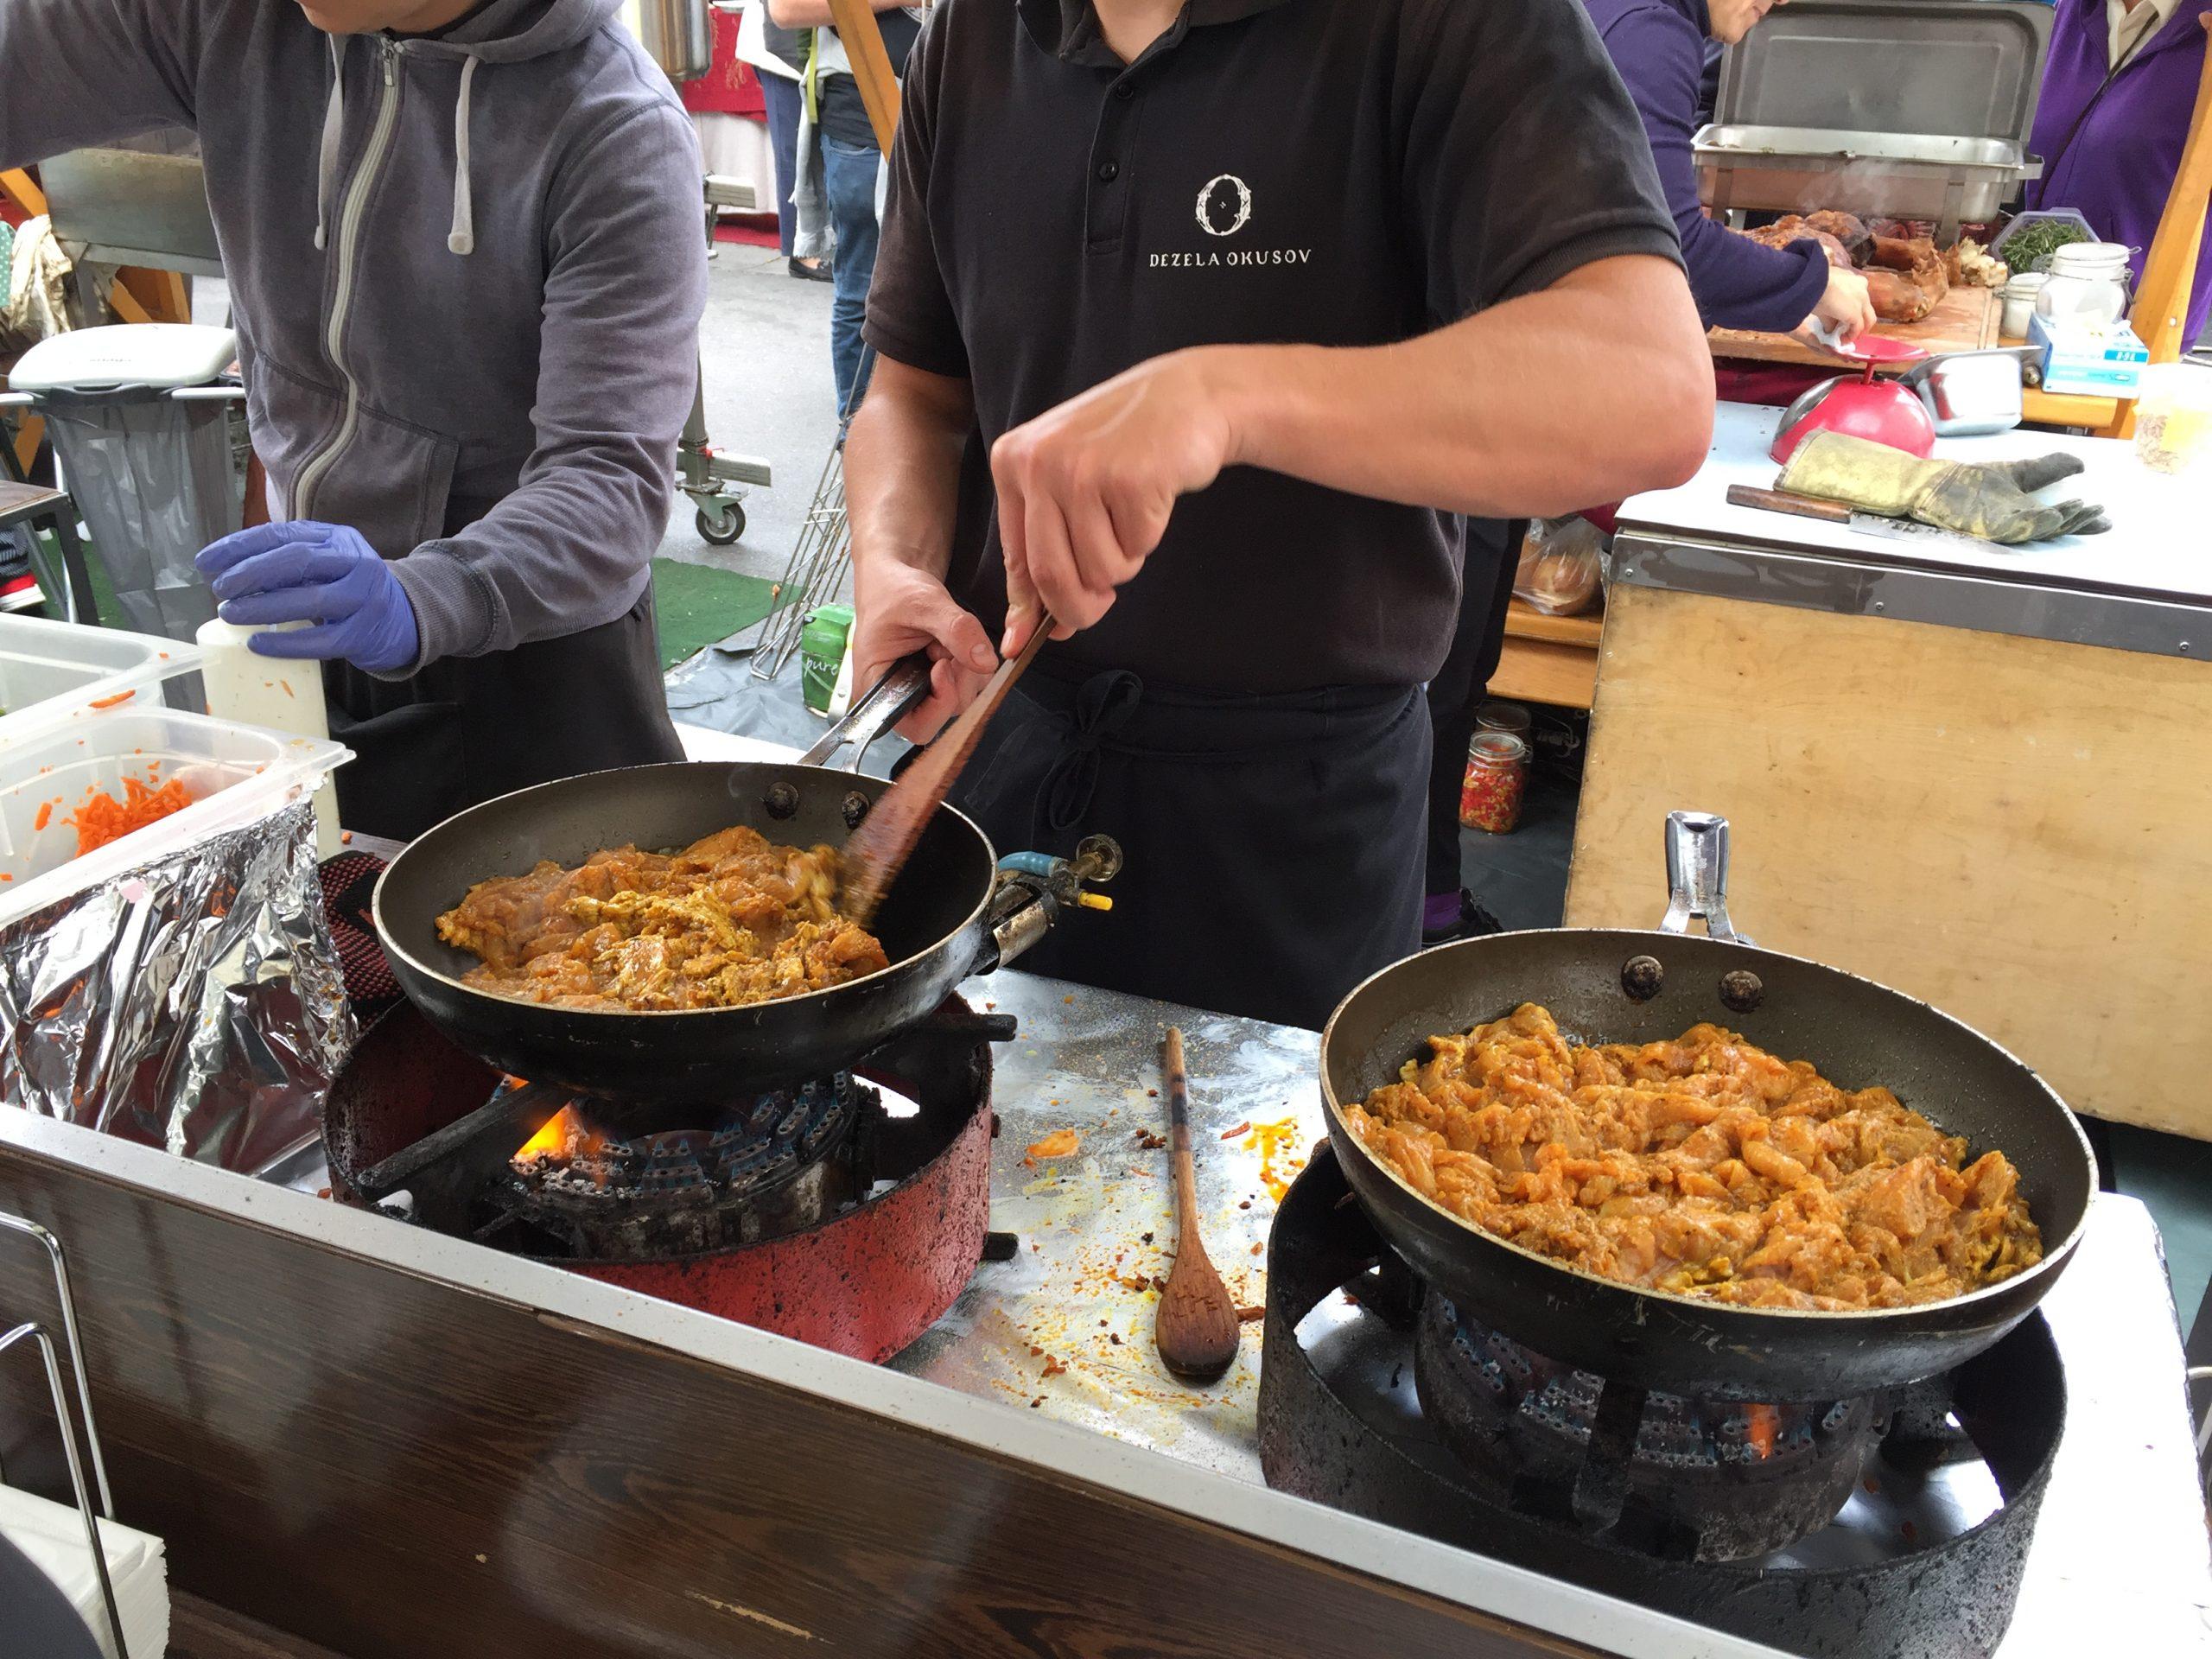 A Friday food festival in Ljubljanica, Slovenia